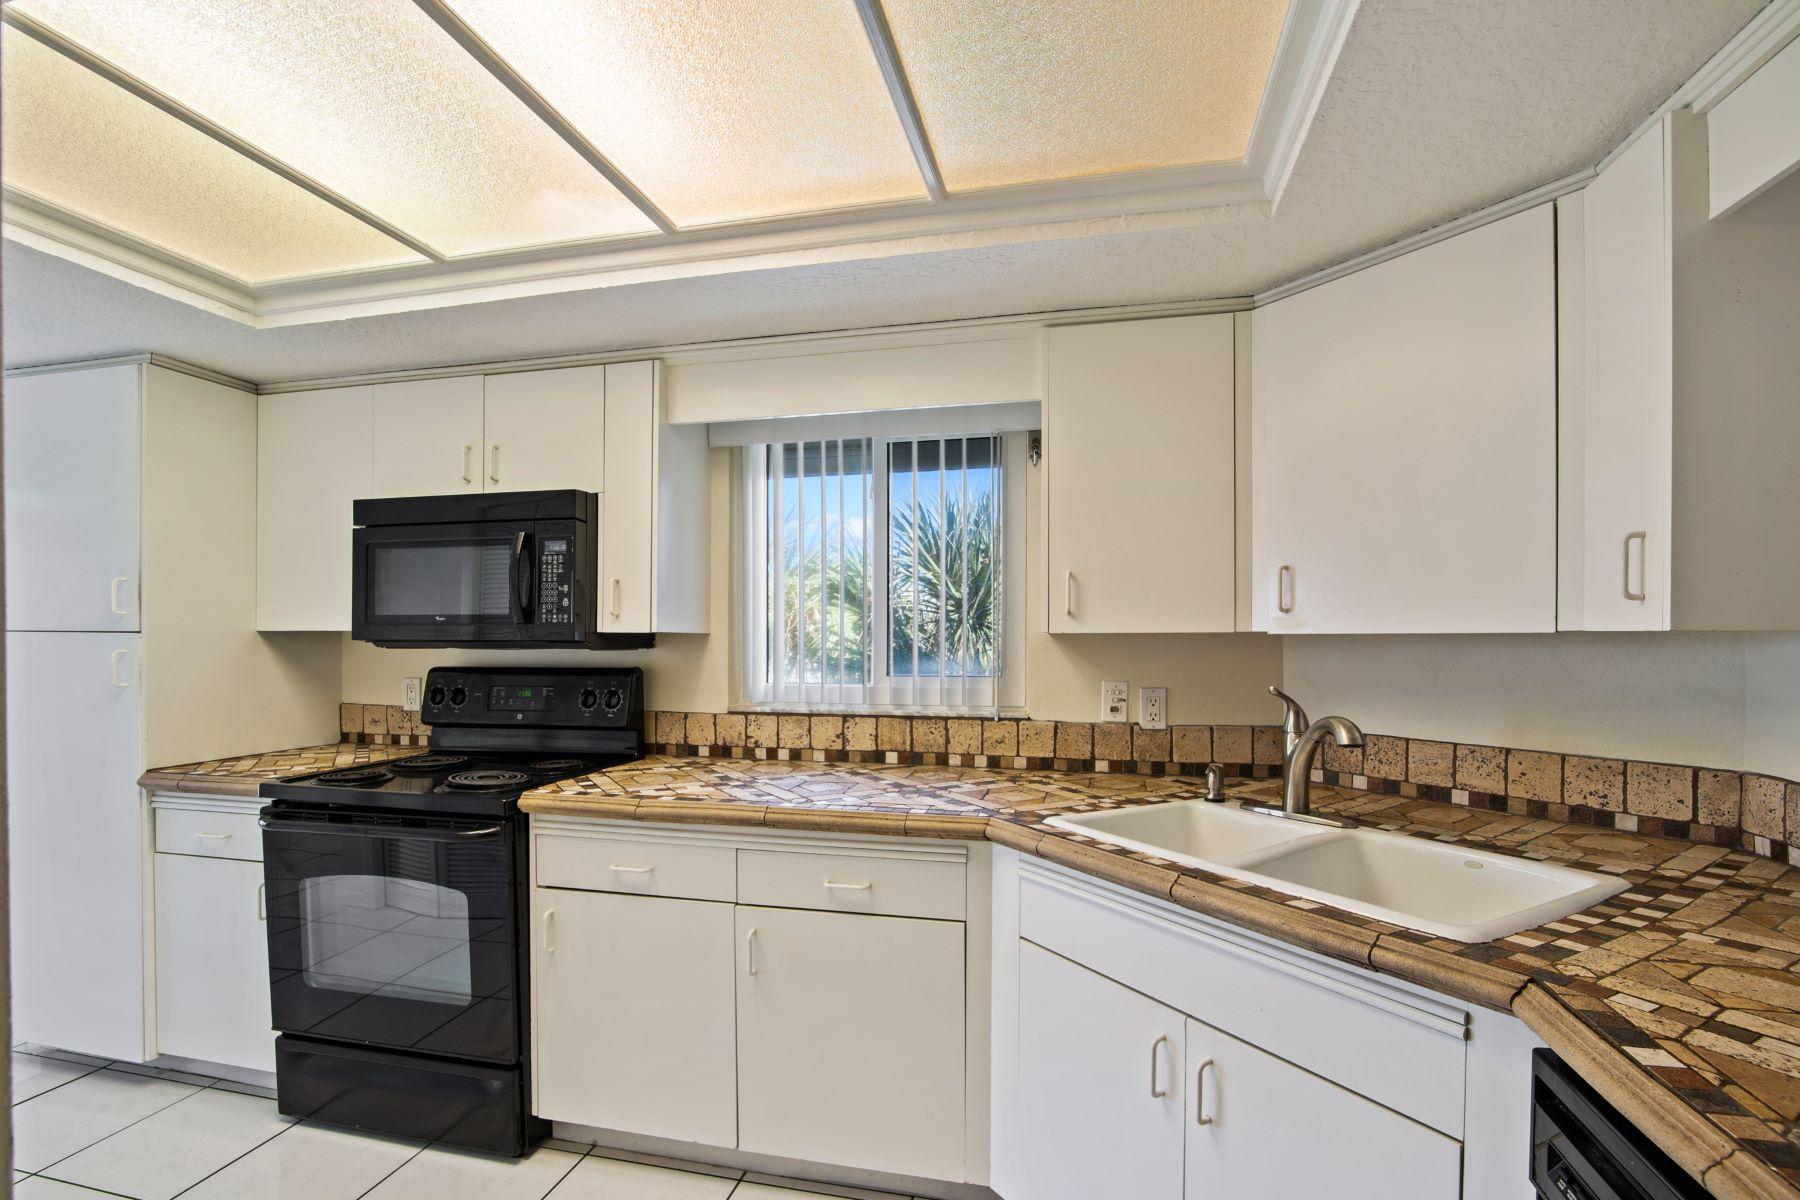 Additional photo for property listing at Casa Playa Condo 3031 S. Atlantic Avenue #201 Cocoa Beach, Florida 32931 United States